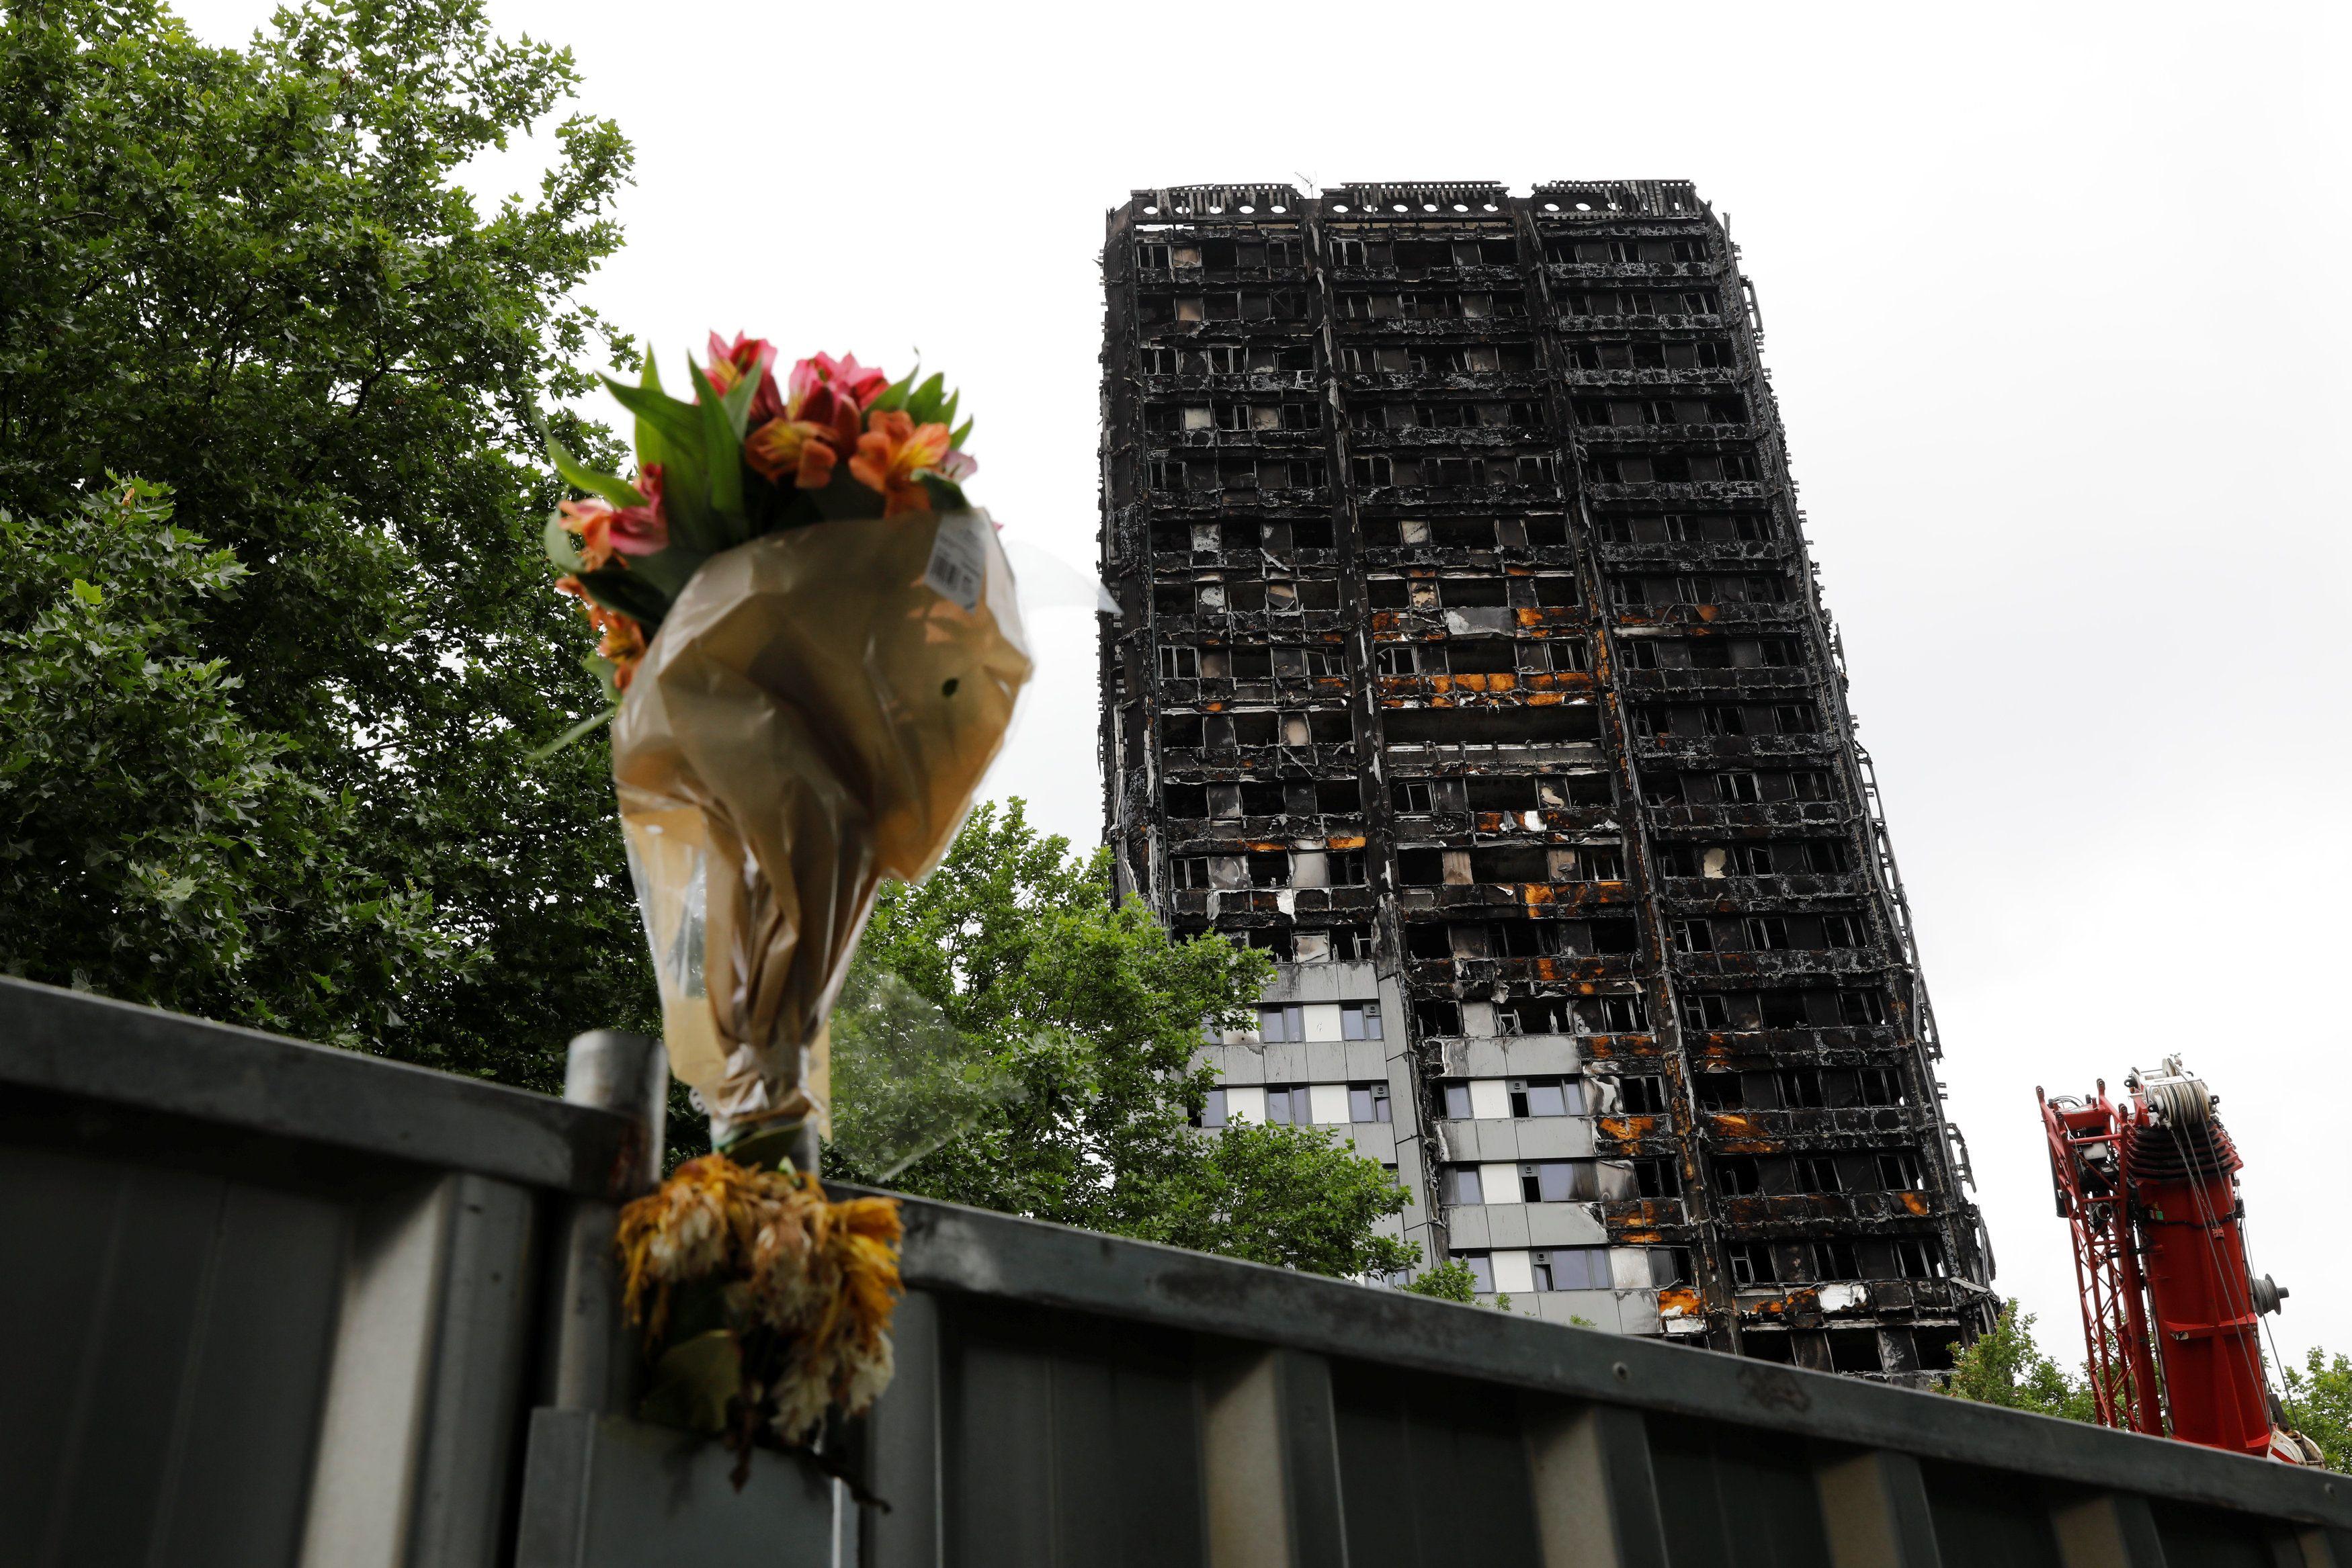 Polícia investiga incêndio na Grenfell Tower como homicídio